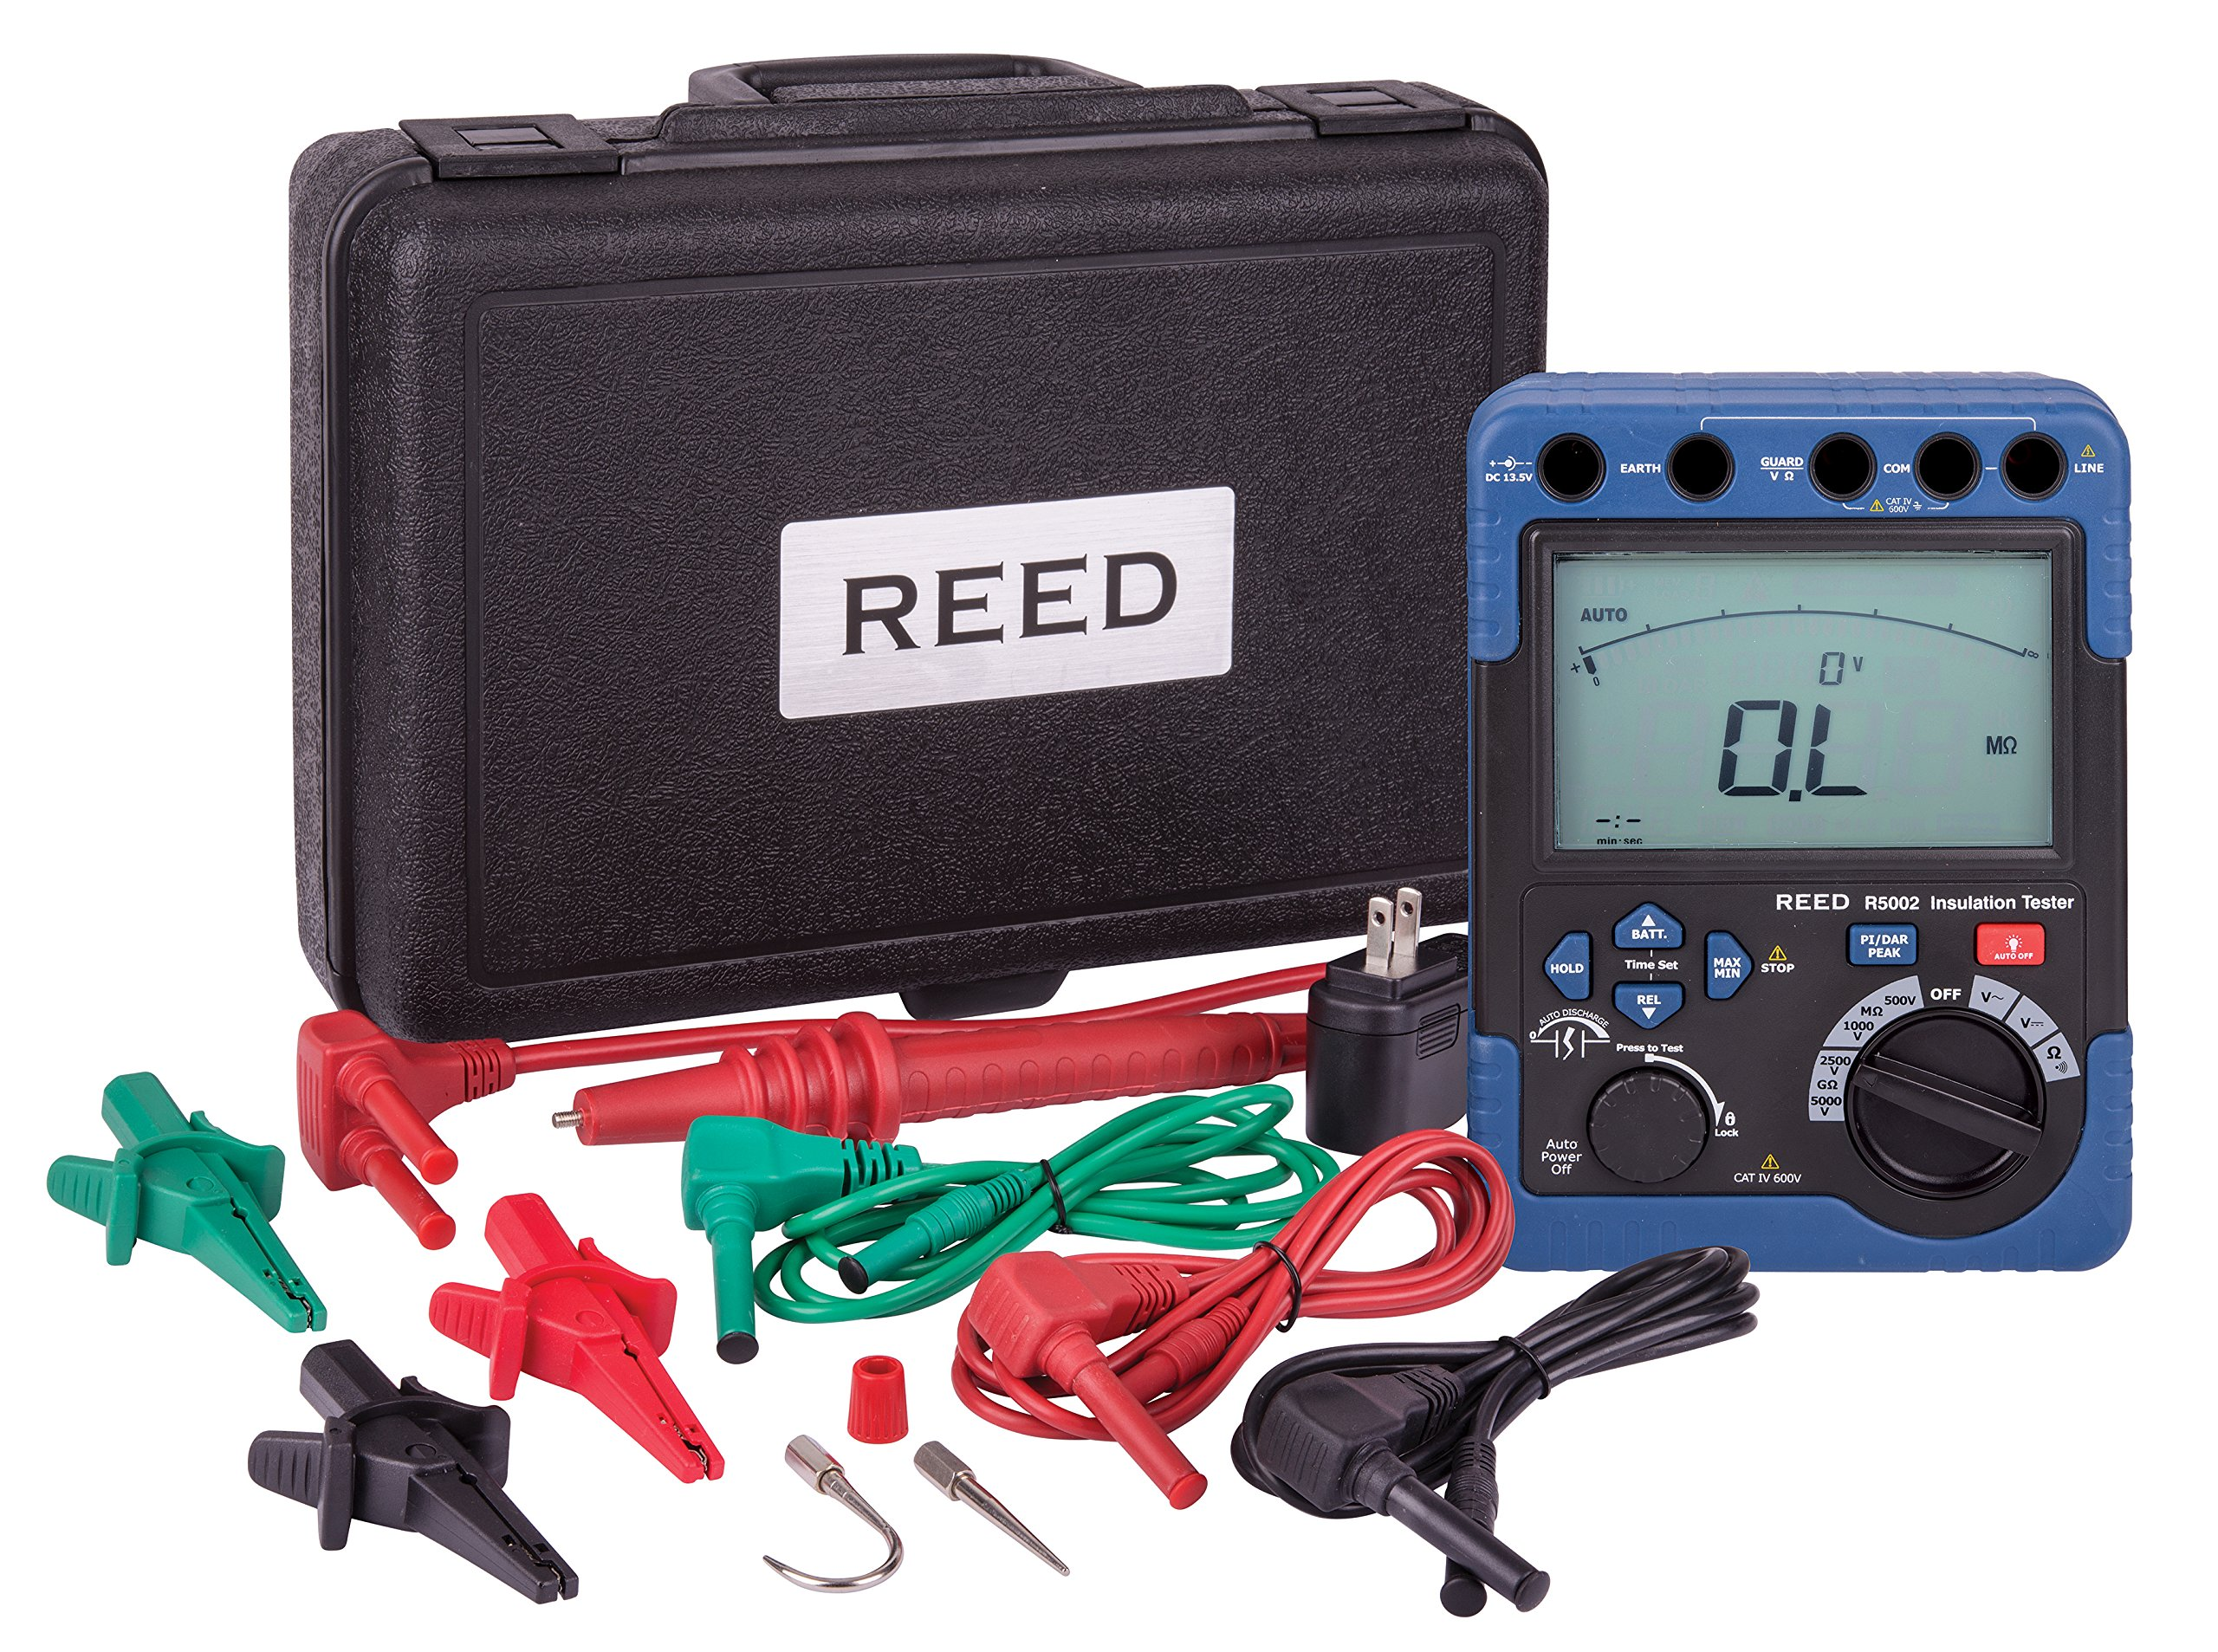 REED Instruments R5002 Digital High Voltage Insulation Tester